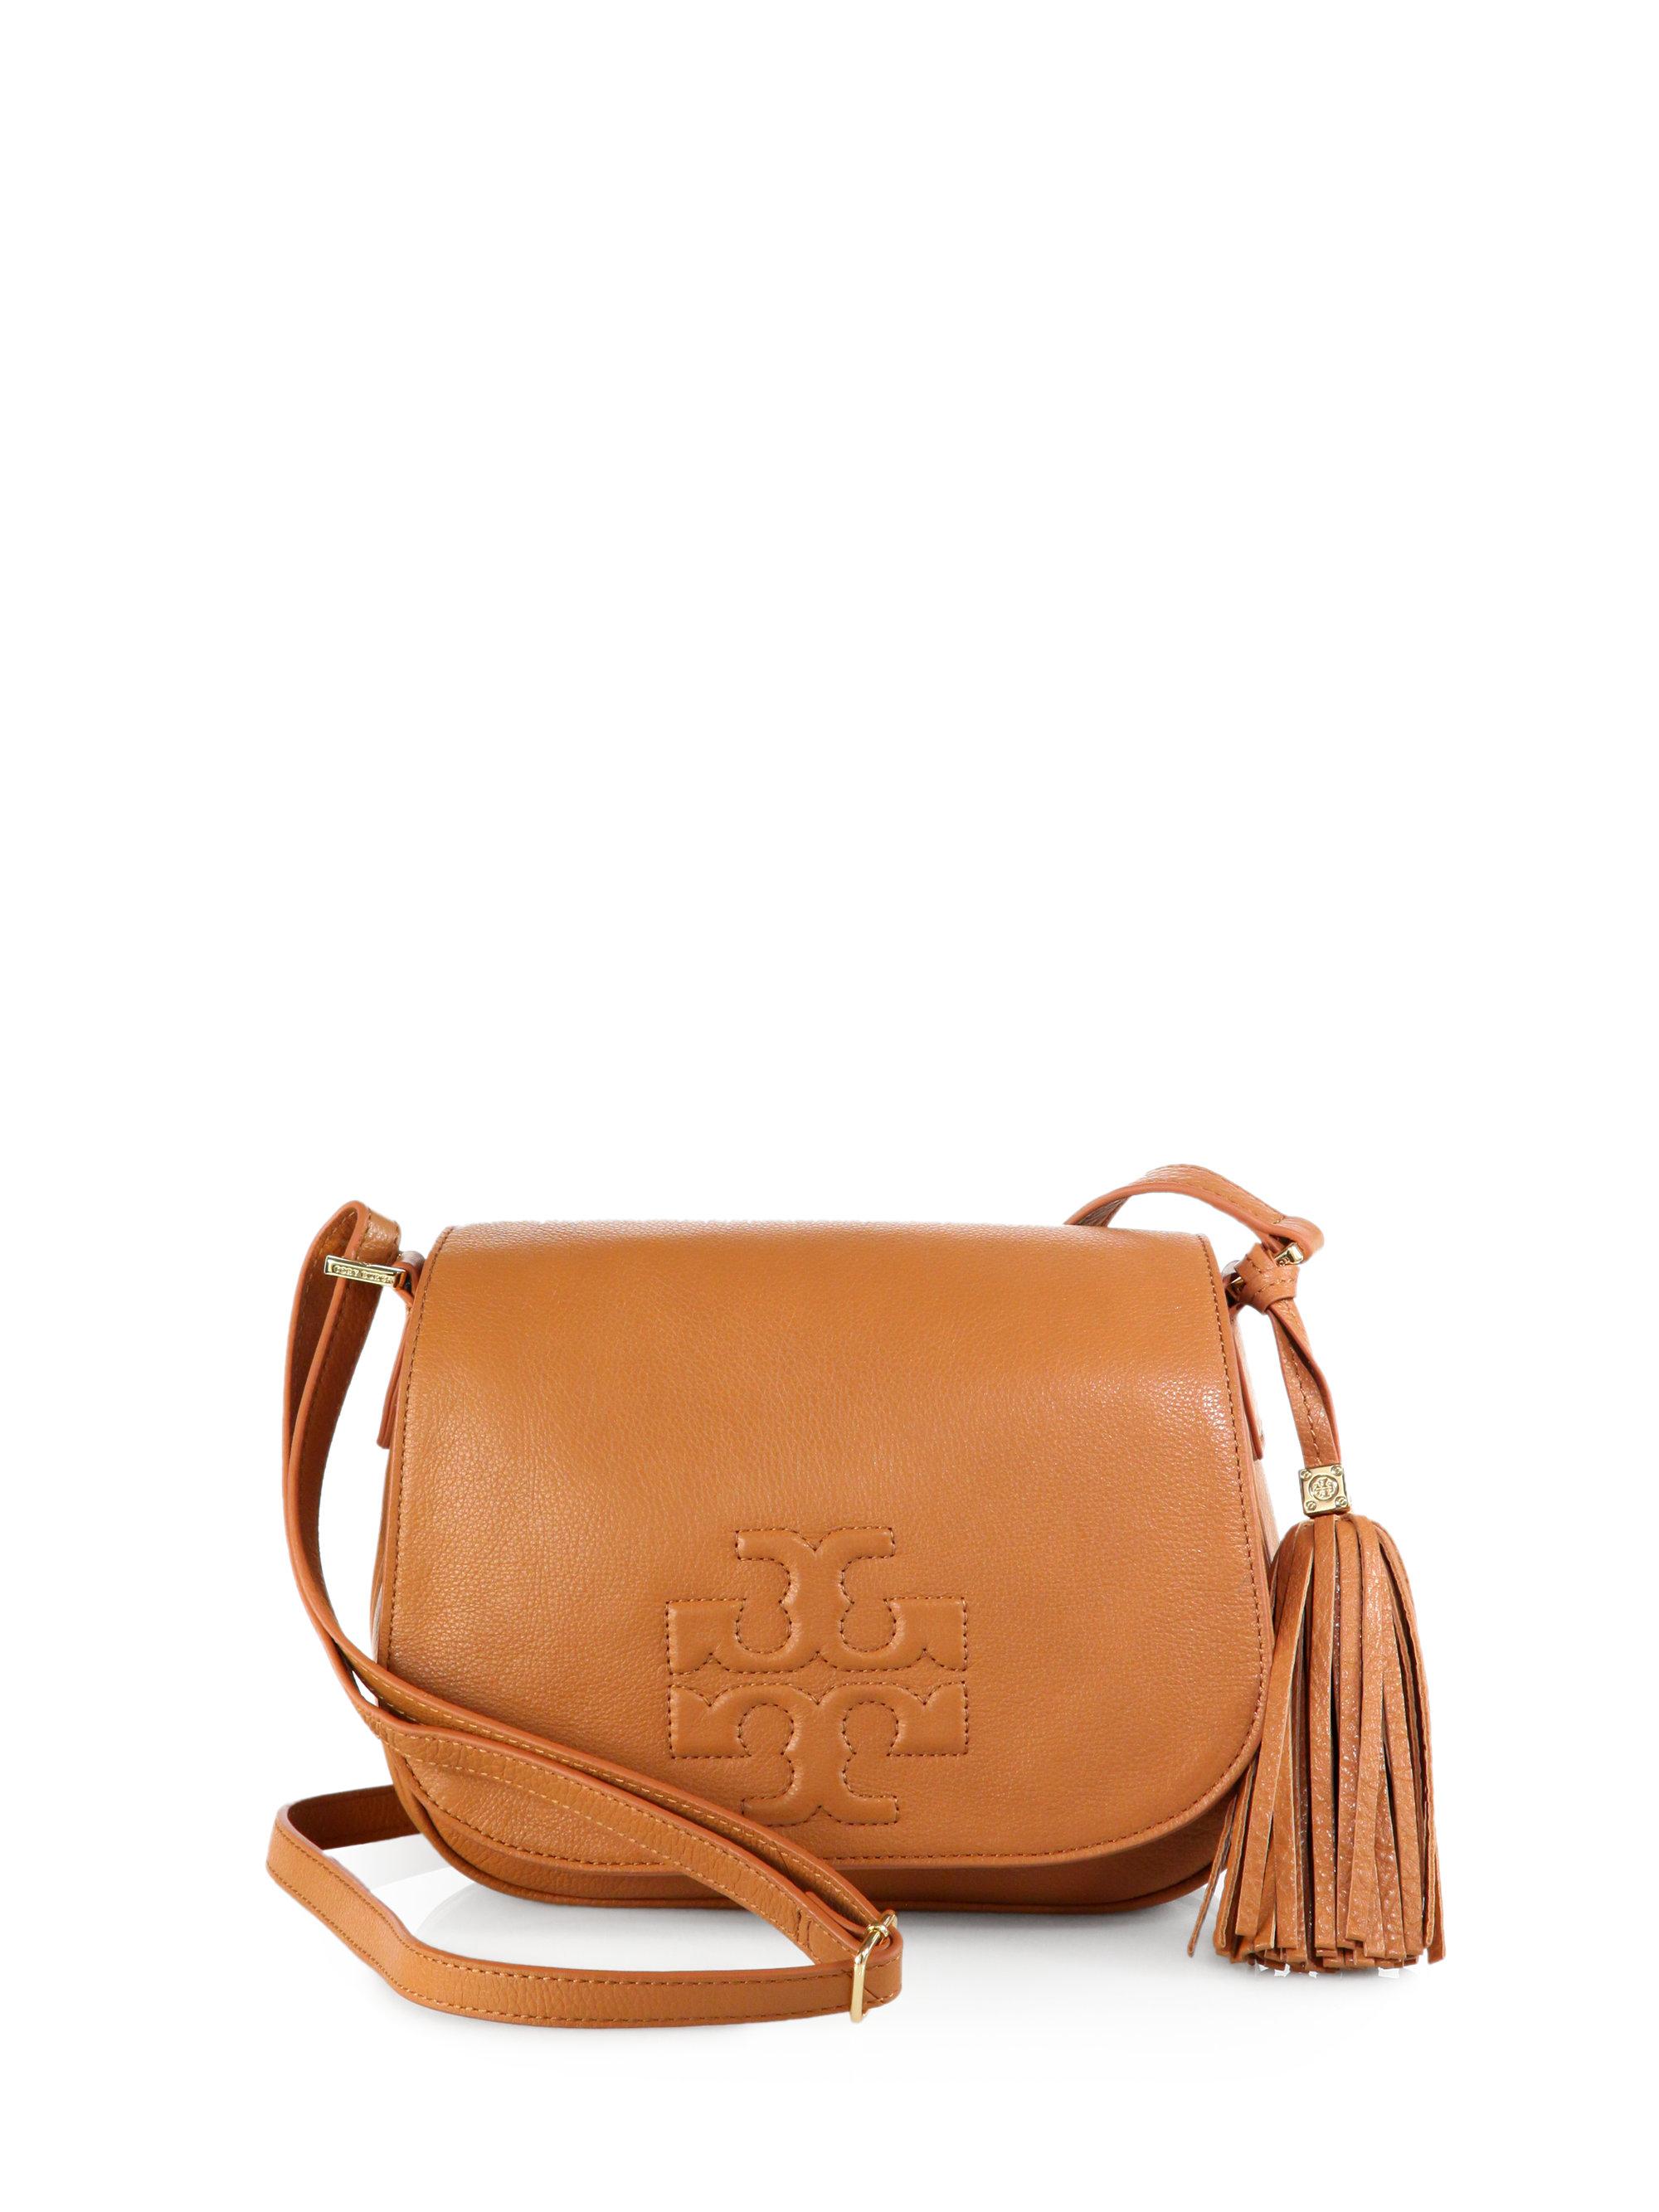 ed9fec69639a Lyst - Tory Burch Thea Leather Fringe Crossbody Bag in Black